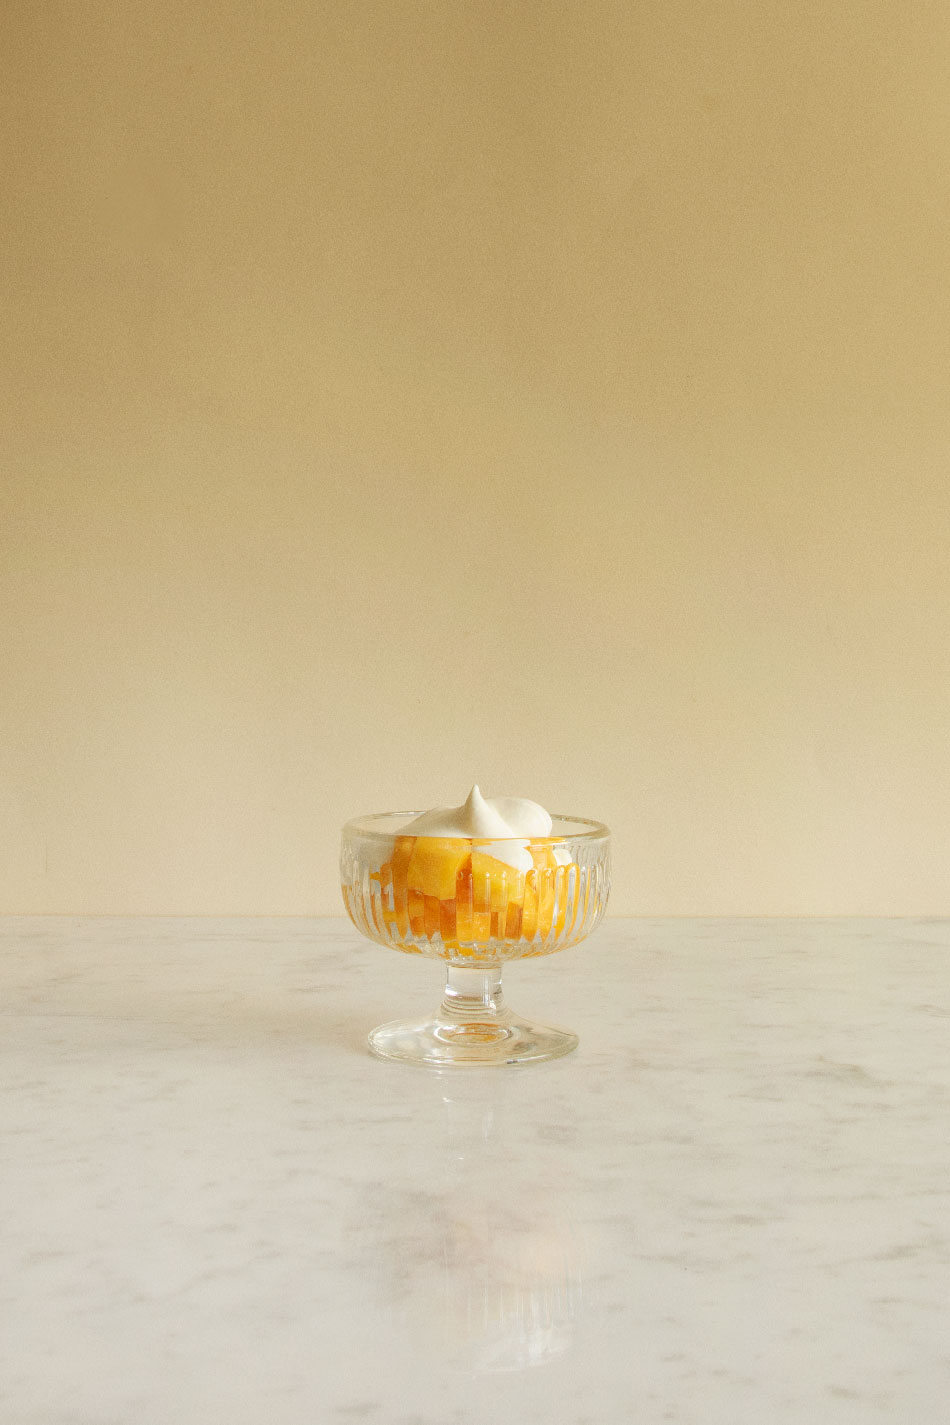 Tahiti Ice Cream Cup